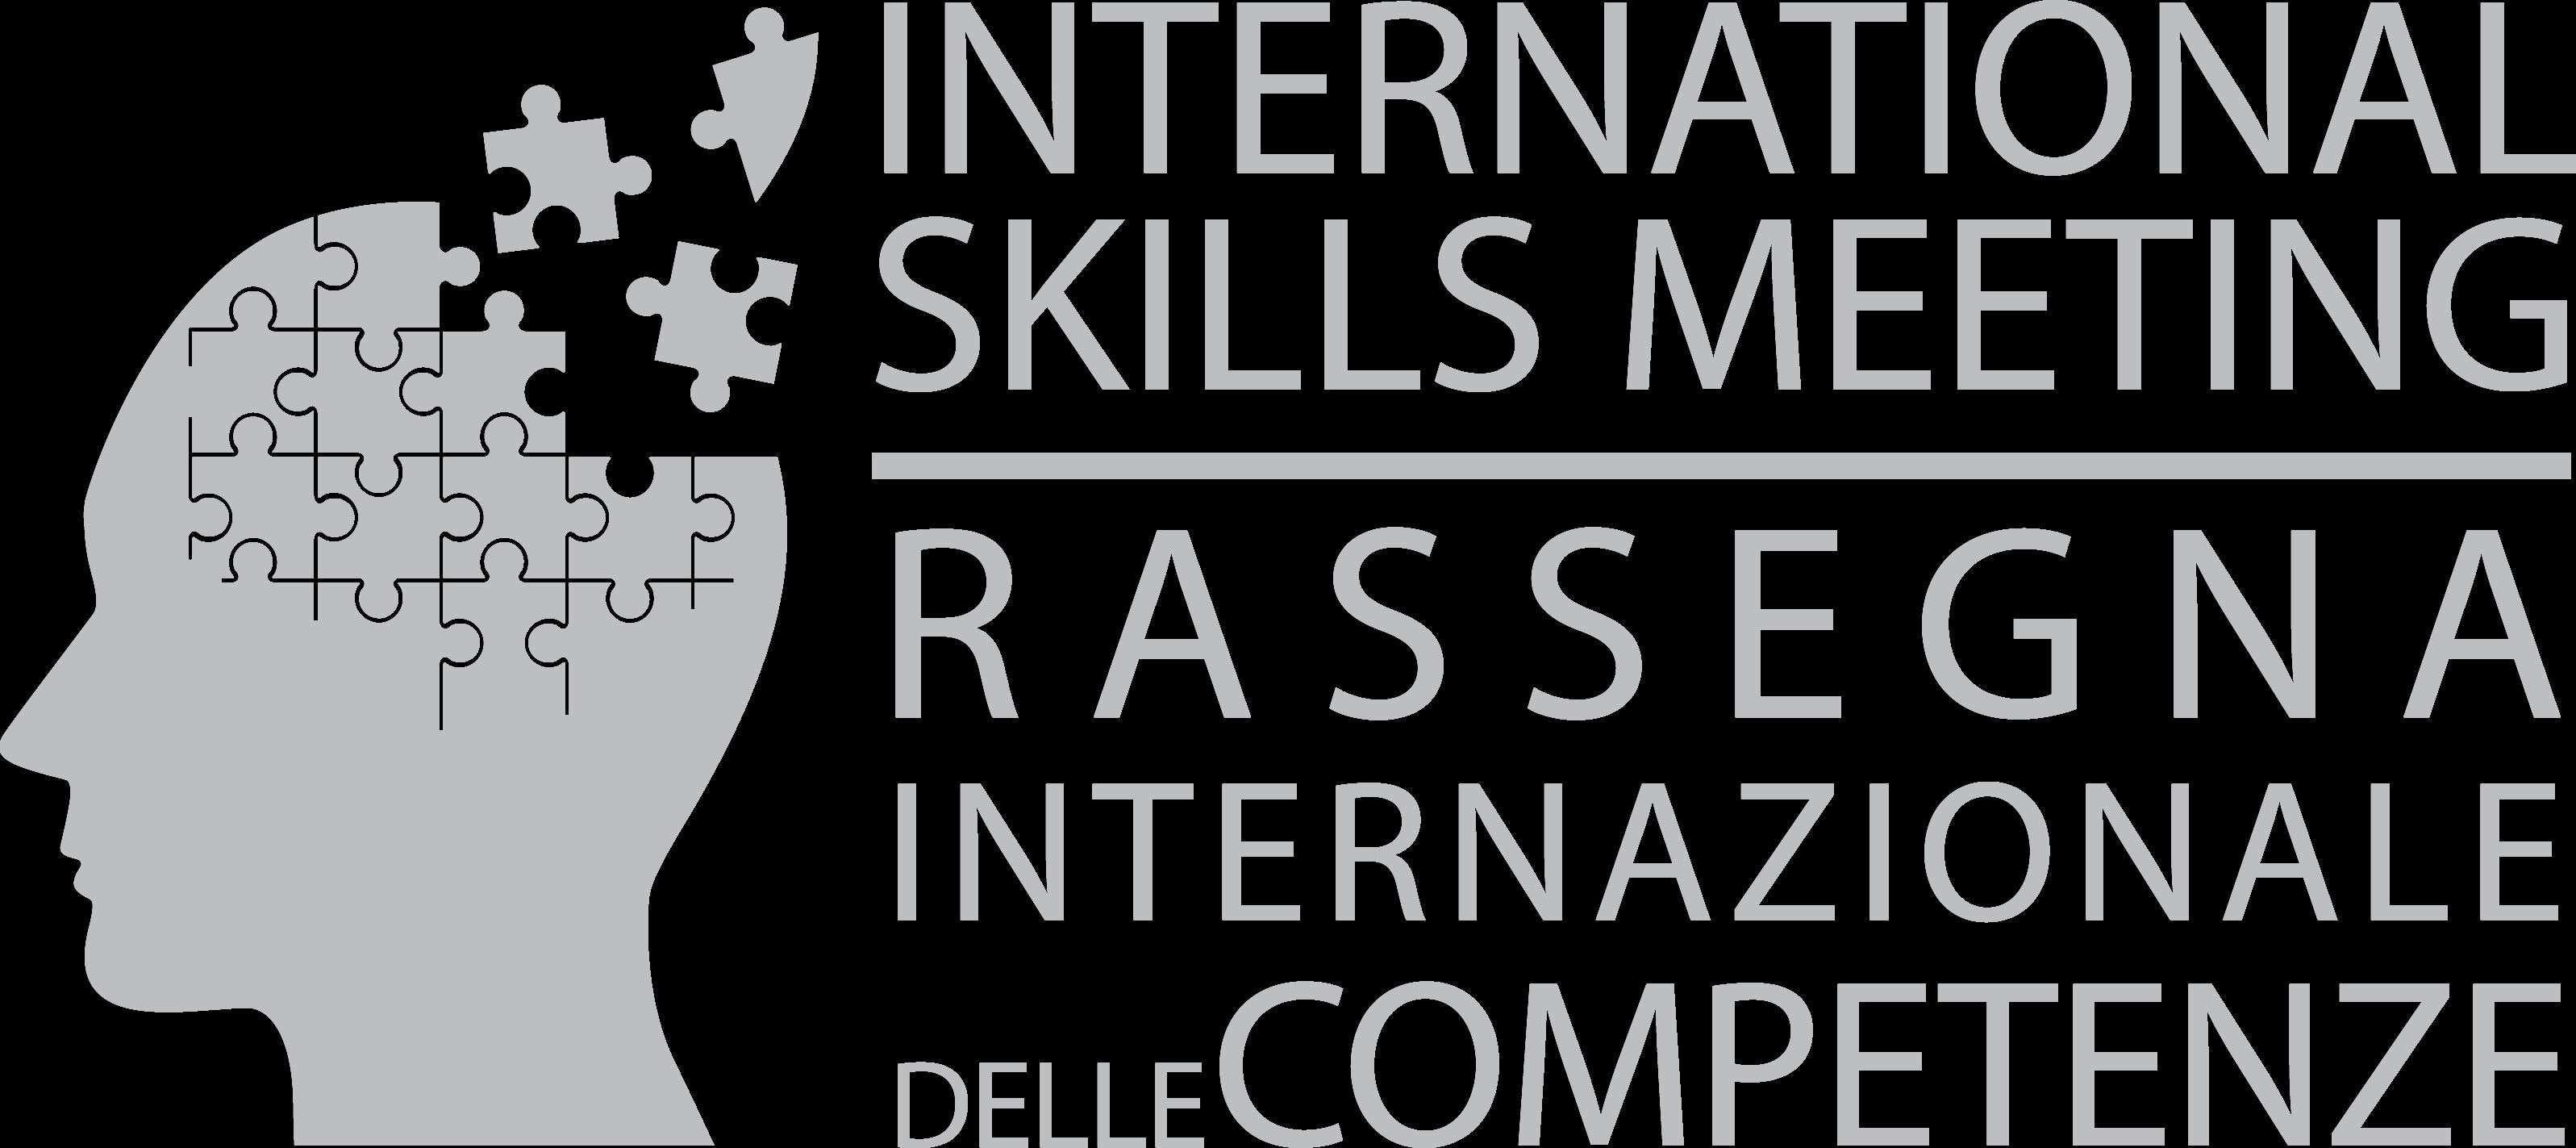 International Skills Meeting / Rassegna Internazionale delle Competenze 2018